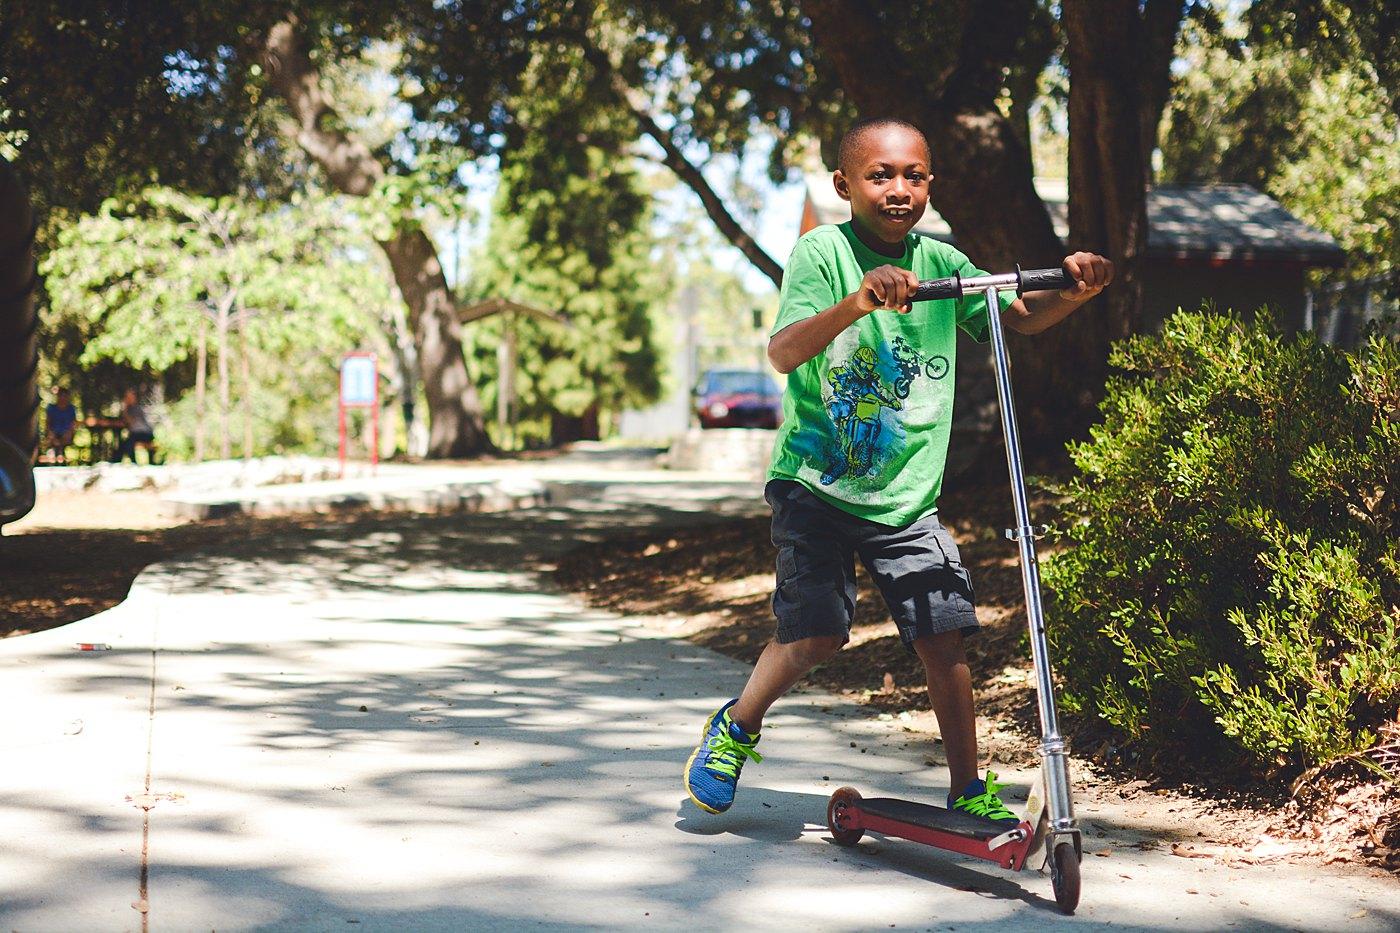 boy riding scooter at schoolhouse park oak glen family photography